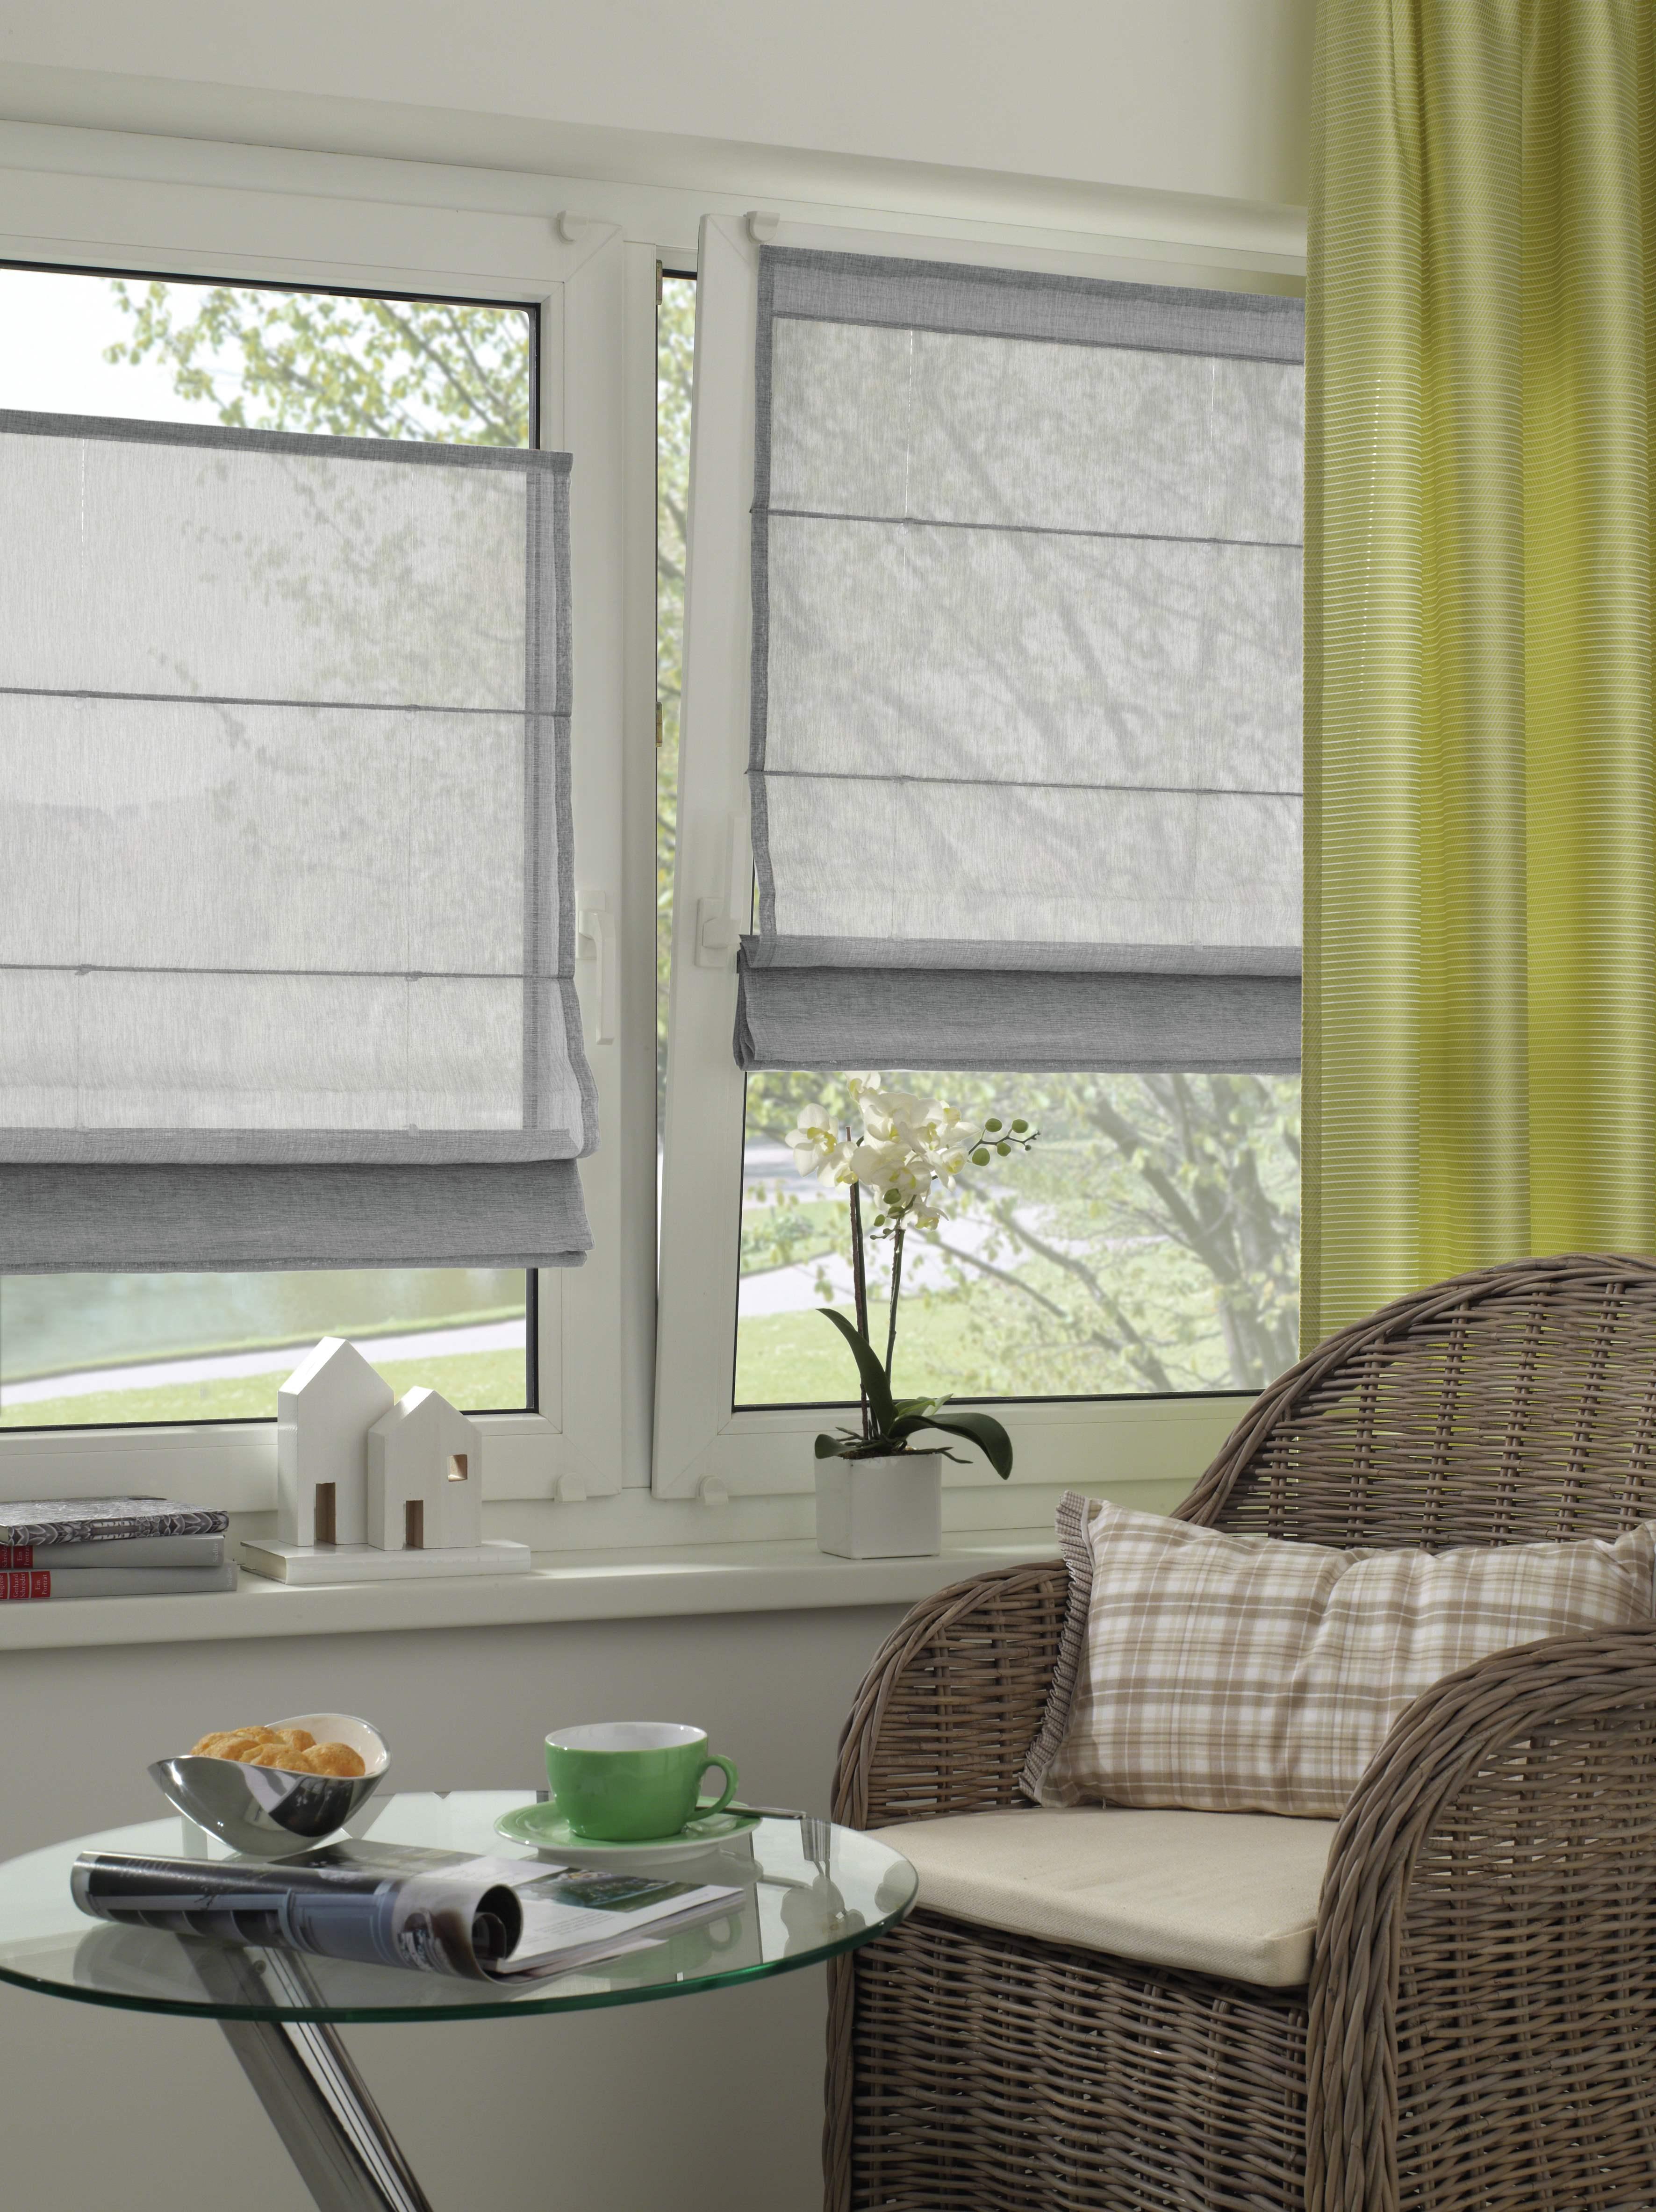 easyfix raffrollo struktur grau 100 x 140 cm 32416. Black Bedroom Furniture Sets. Home Design Ideas